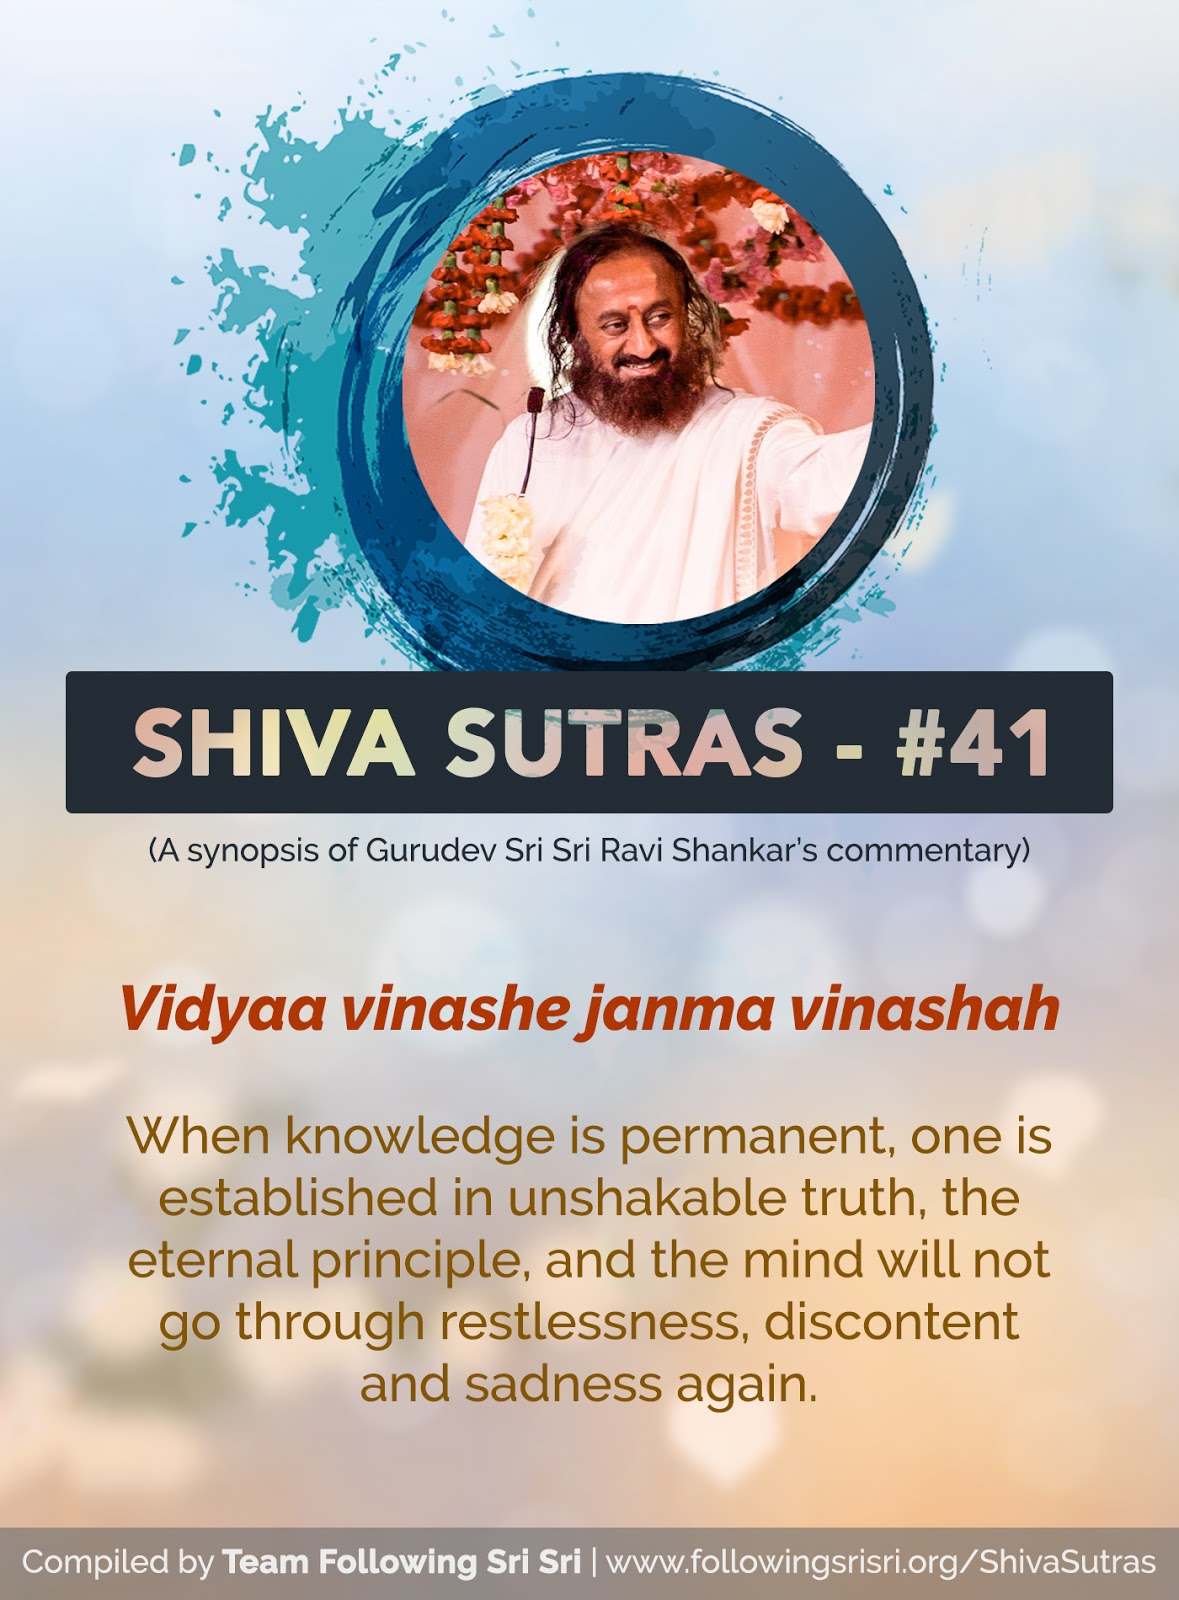 Shiva Sutras - Sutra 41